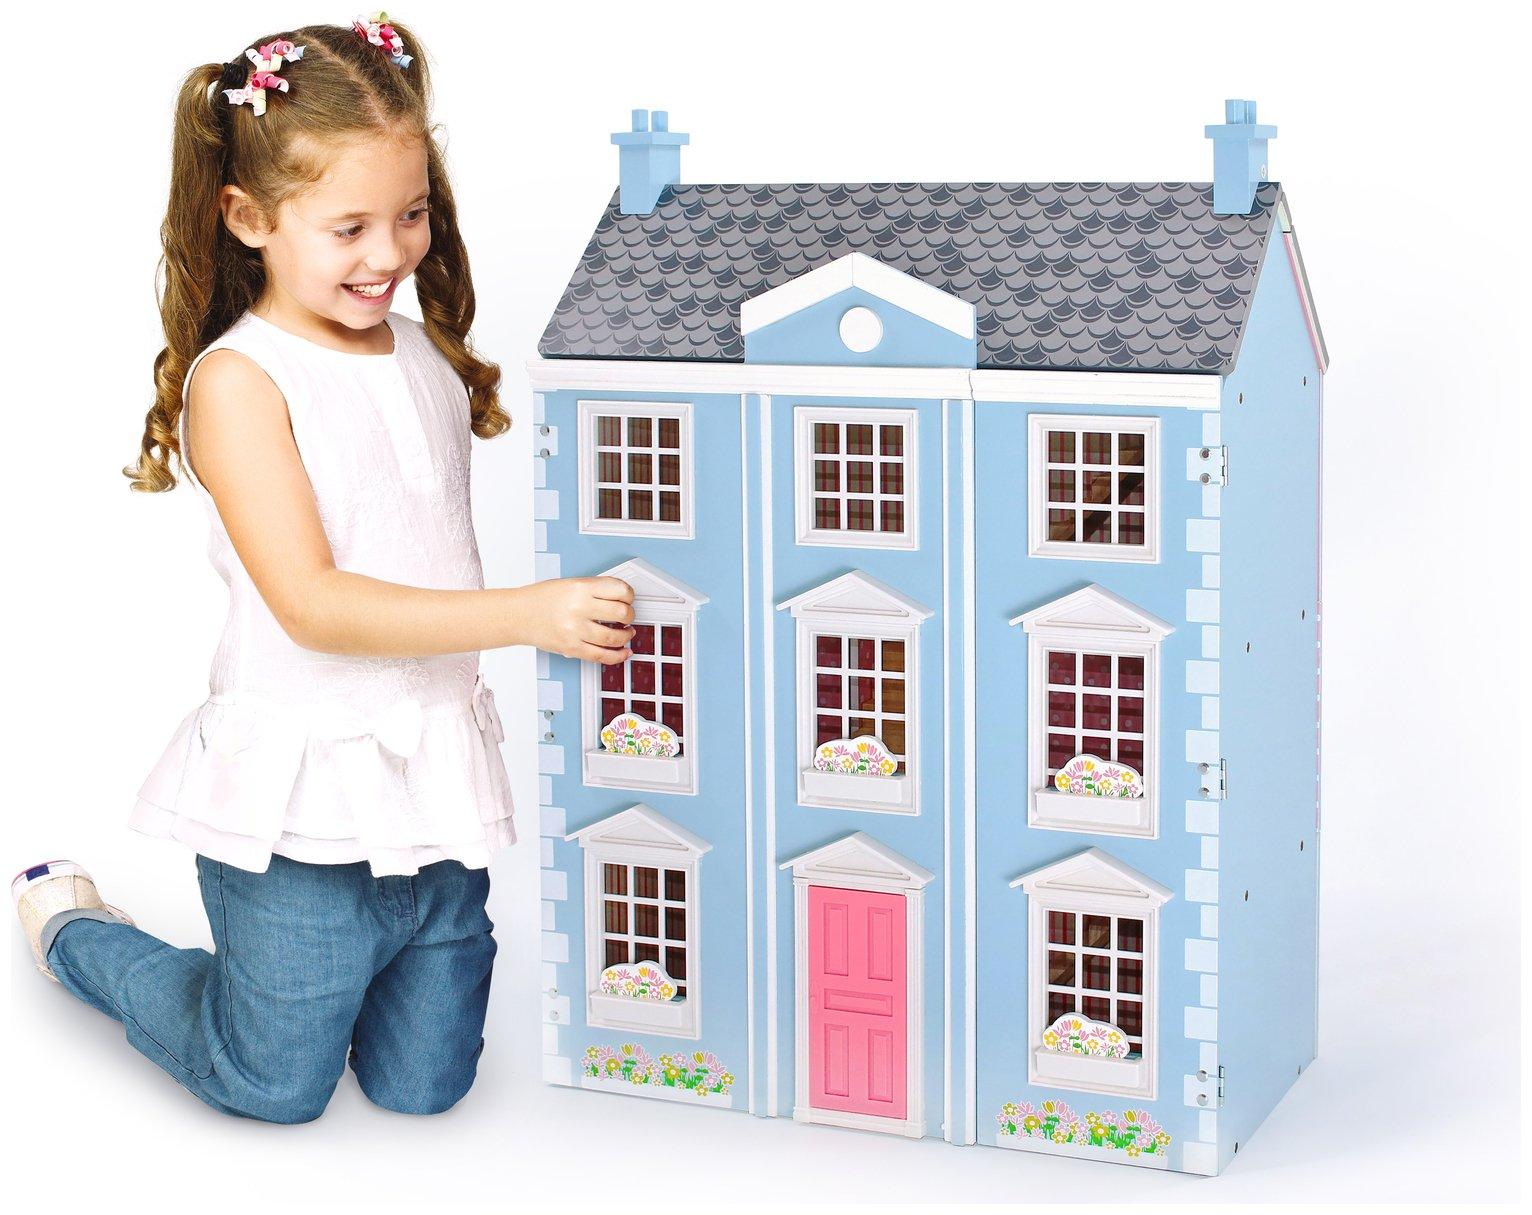 Jupiter Workshops Wooden Georgian Manor Dolls House